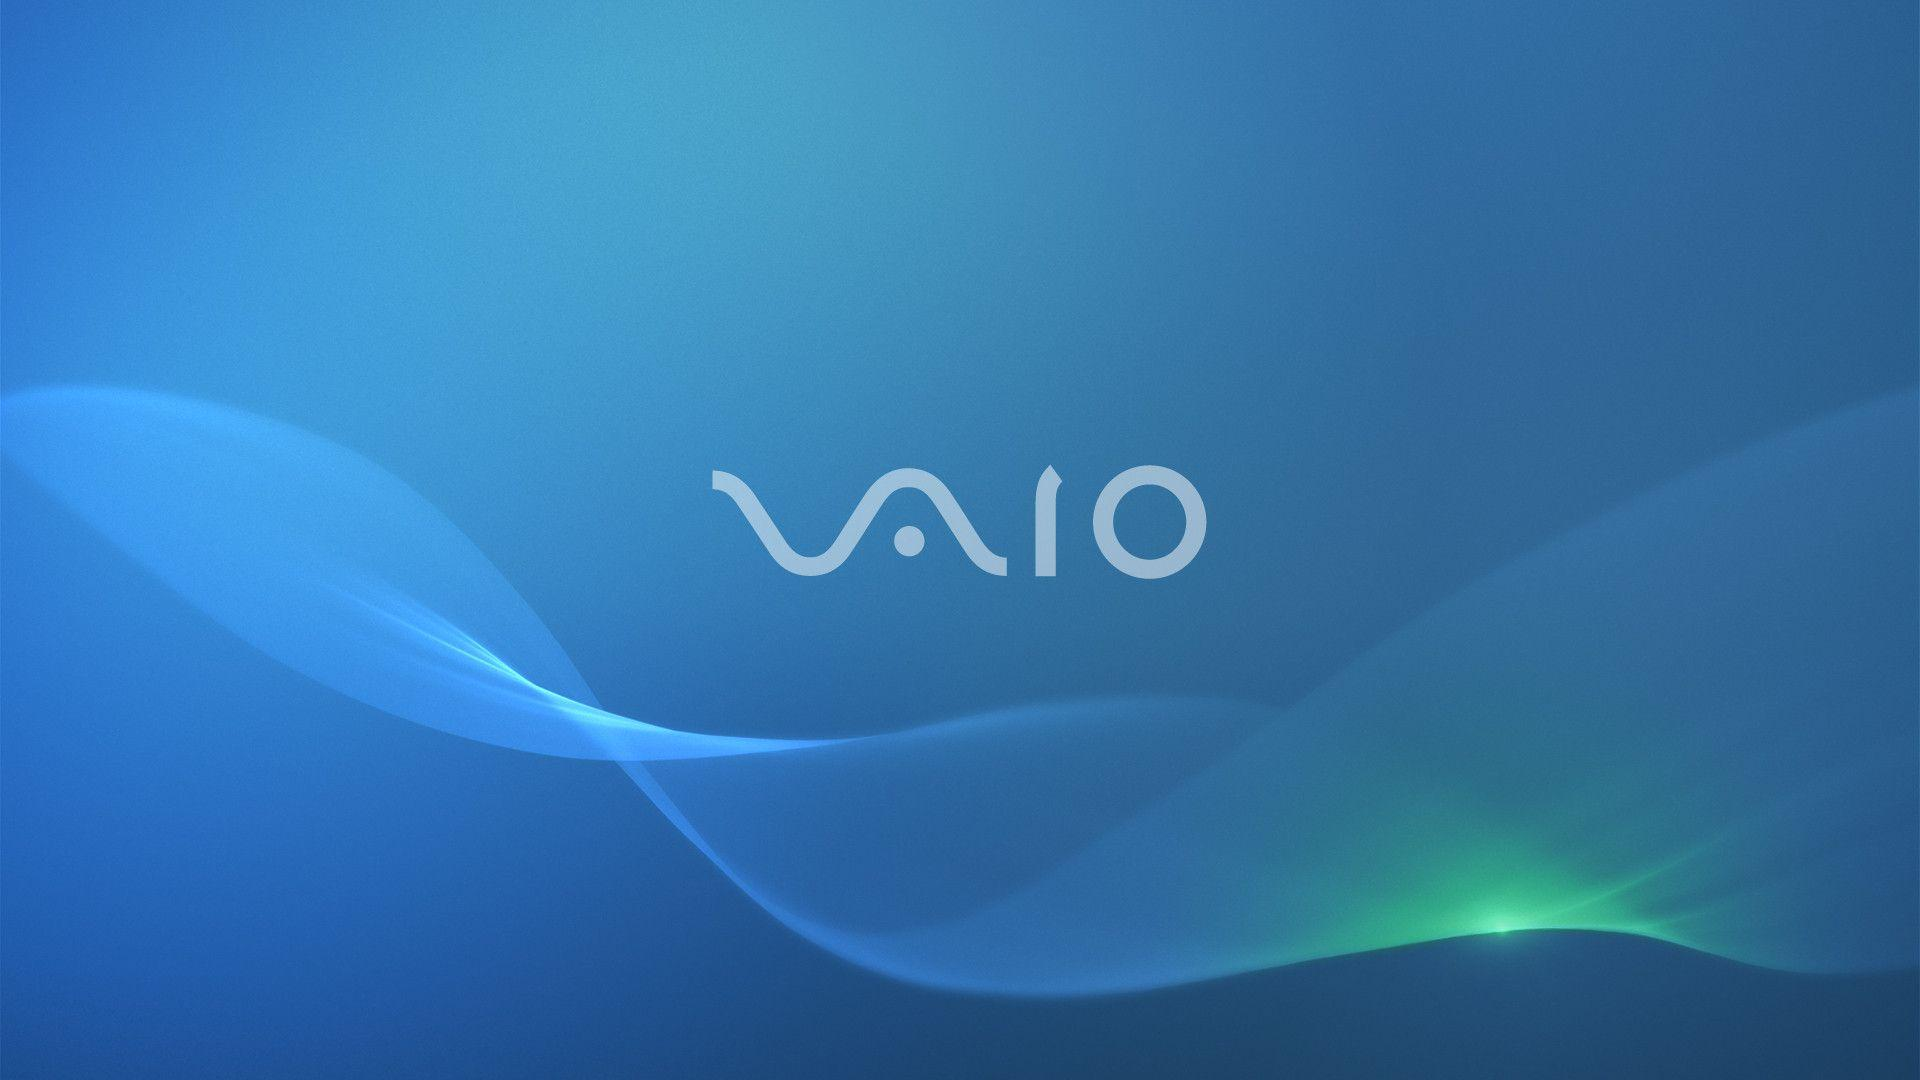 Sony vaio wallpapers top free sony vaio backgrounds wallpaperaccess - Sony vaio wallpaper 1280x800 ...